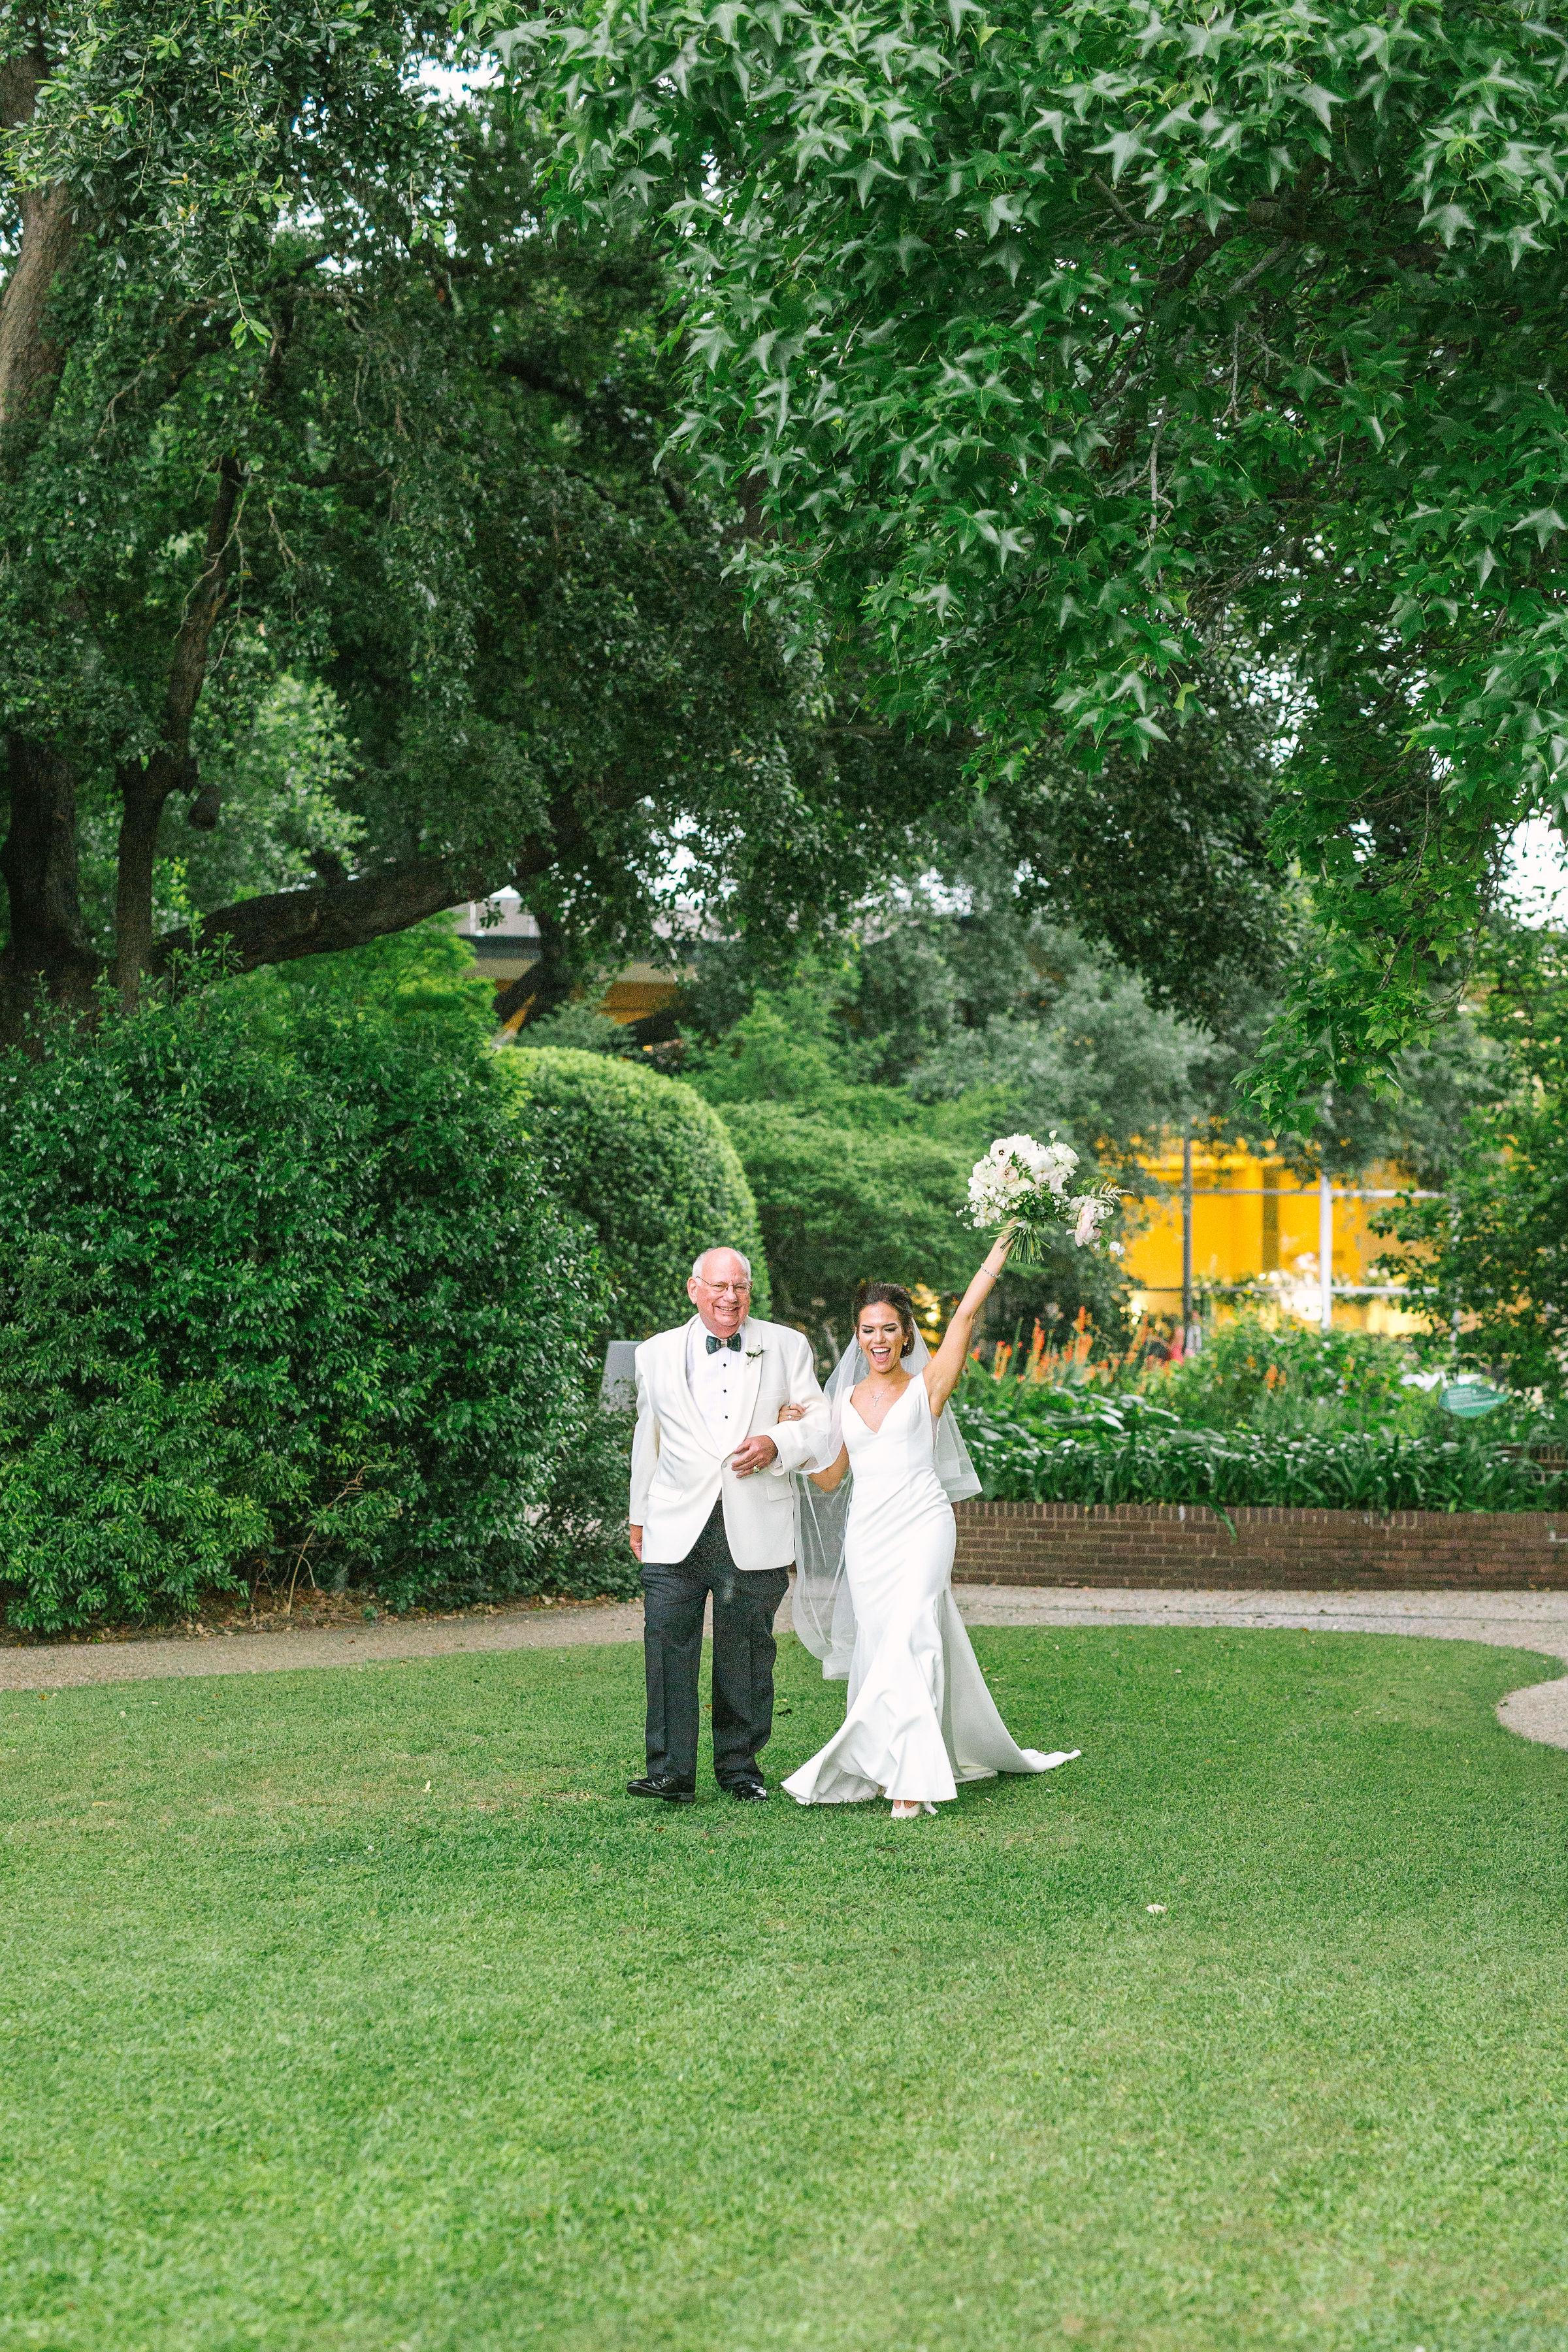 Ellen-Ashton-Photography-Dallas-Wedding-Photographers-Ivory-and-vine-Weddings-913.jpg